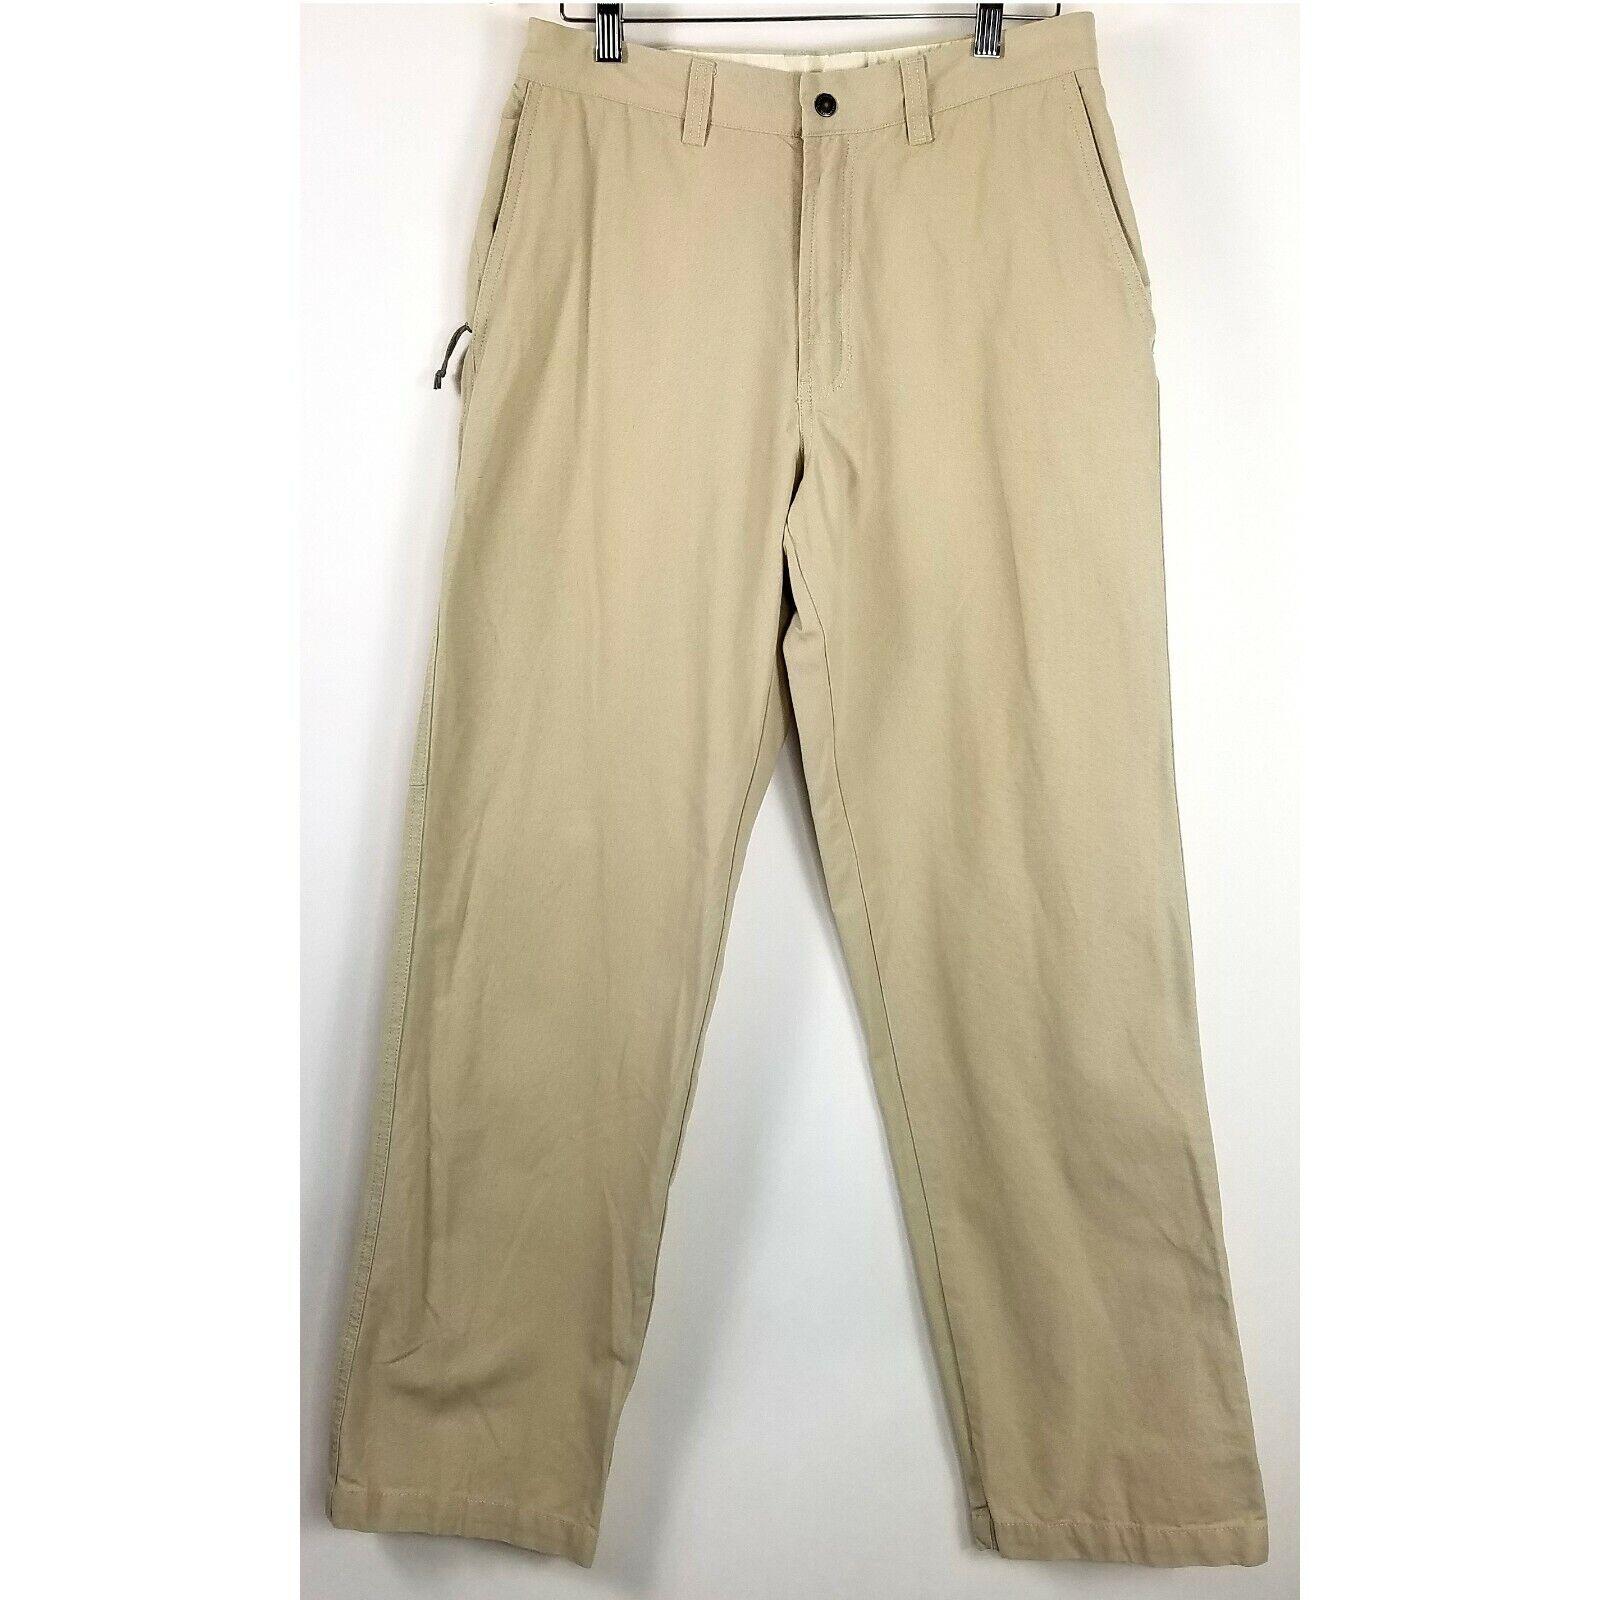 Columbia Mens Khaki Pants 8 oz. Stone Washed Granite Cloth Fabric Size 32 32